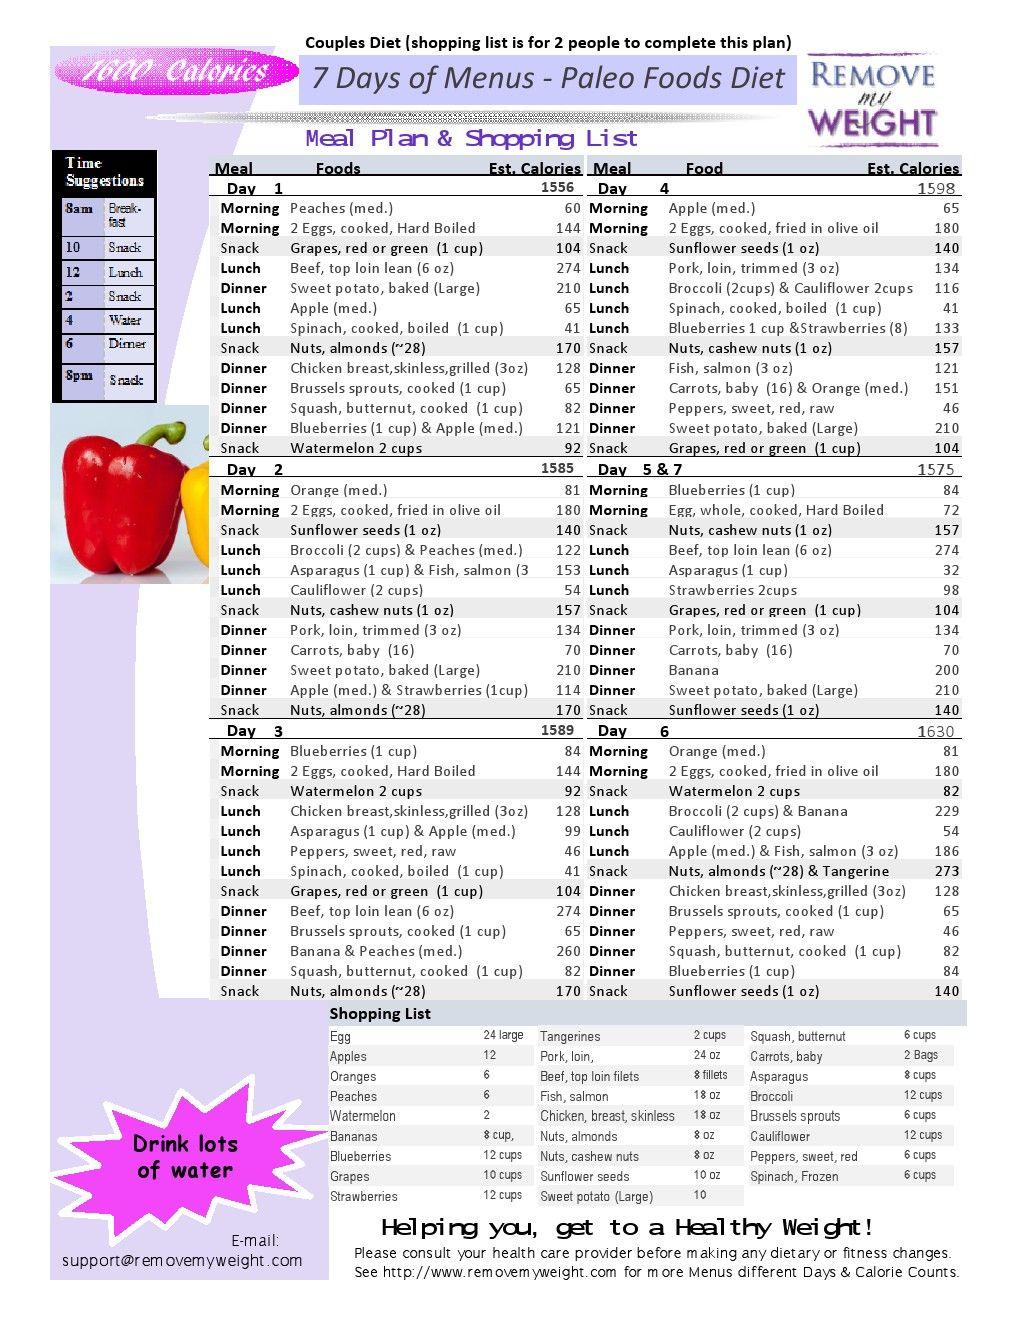 a good 1600 calories a day diet